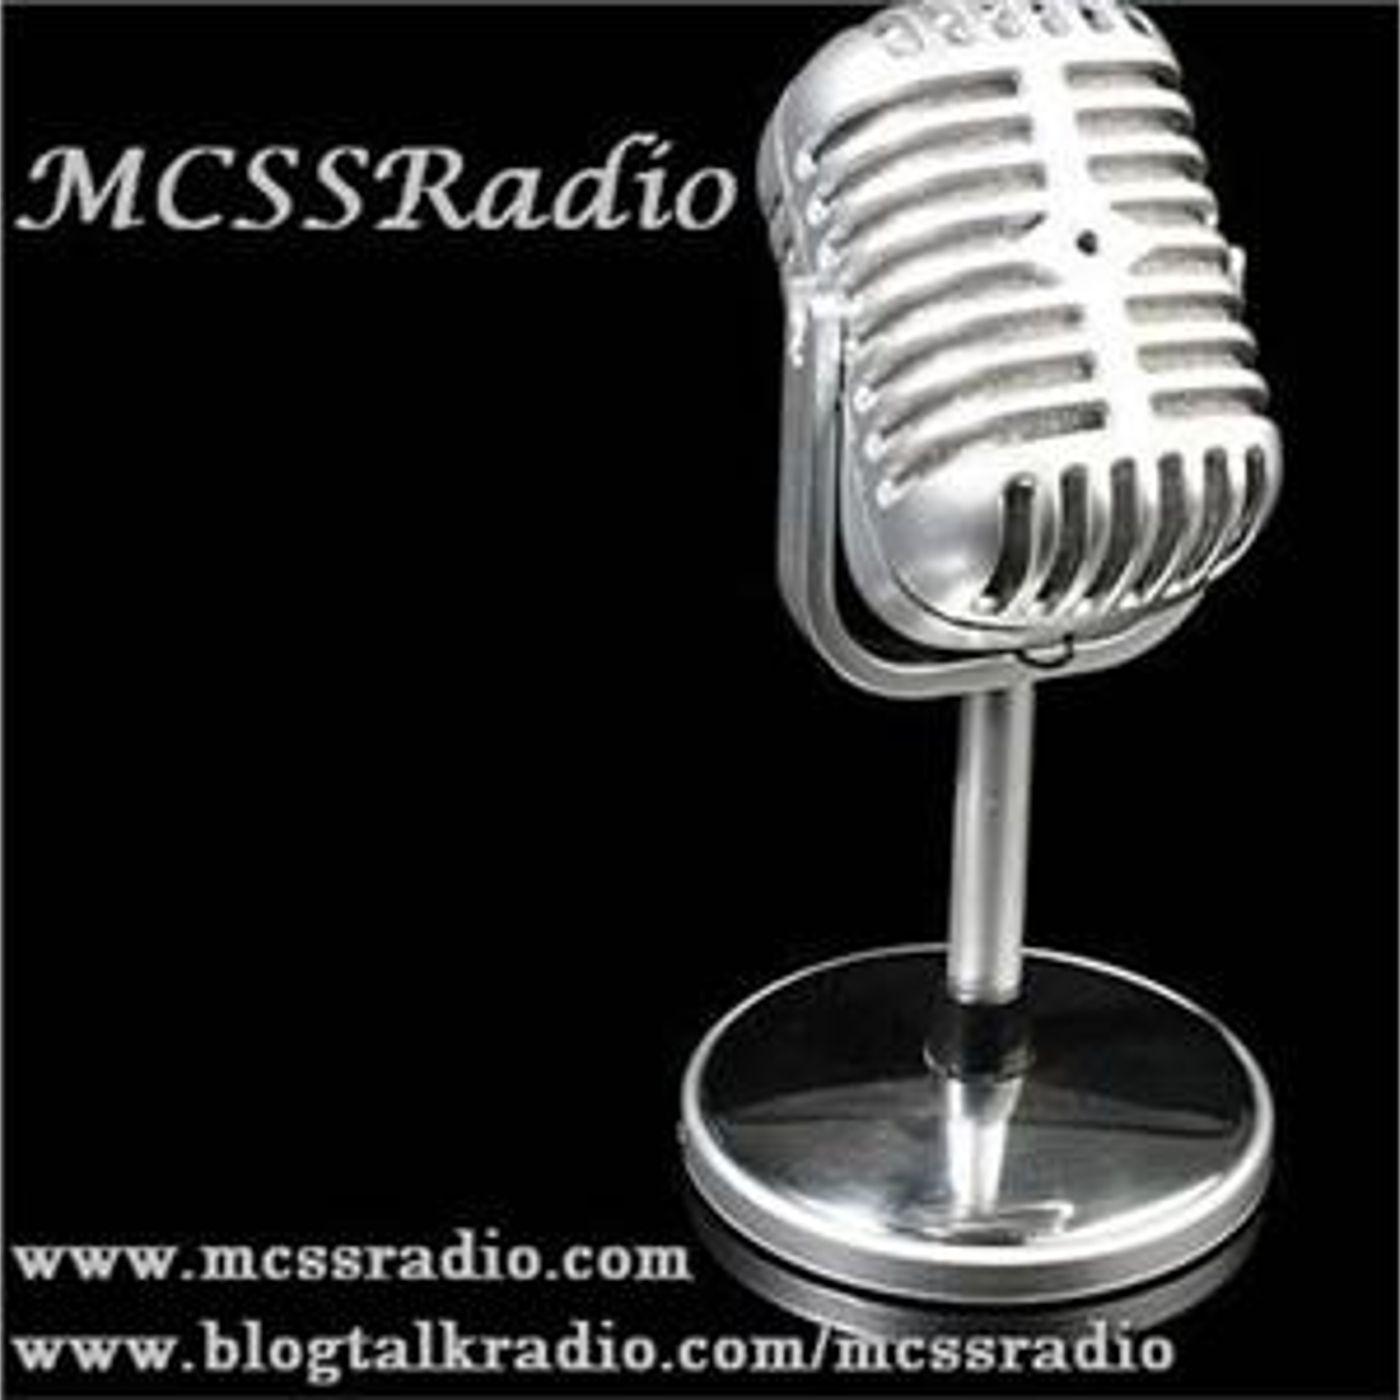 DJ LoveFreq / Jacinta Starting at 8 pm central M-F